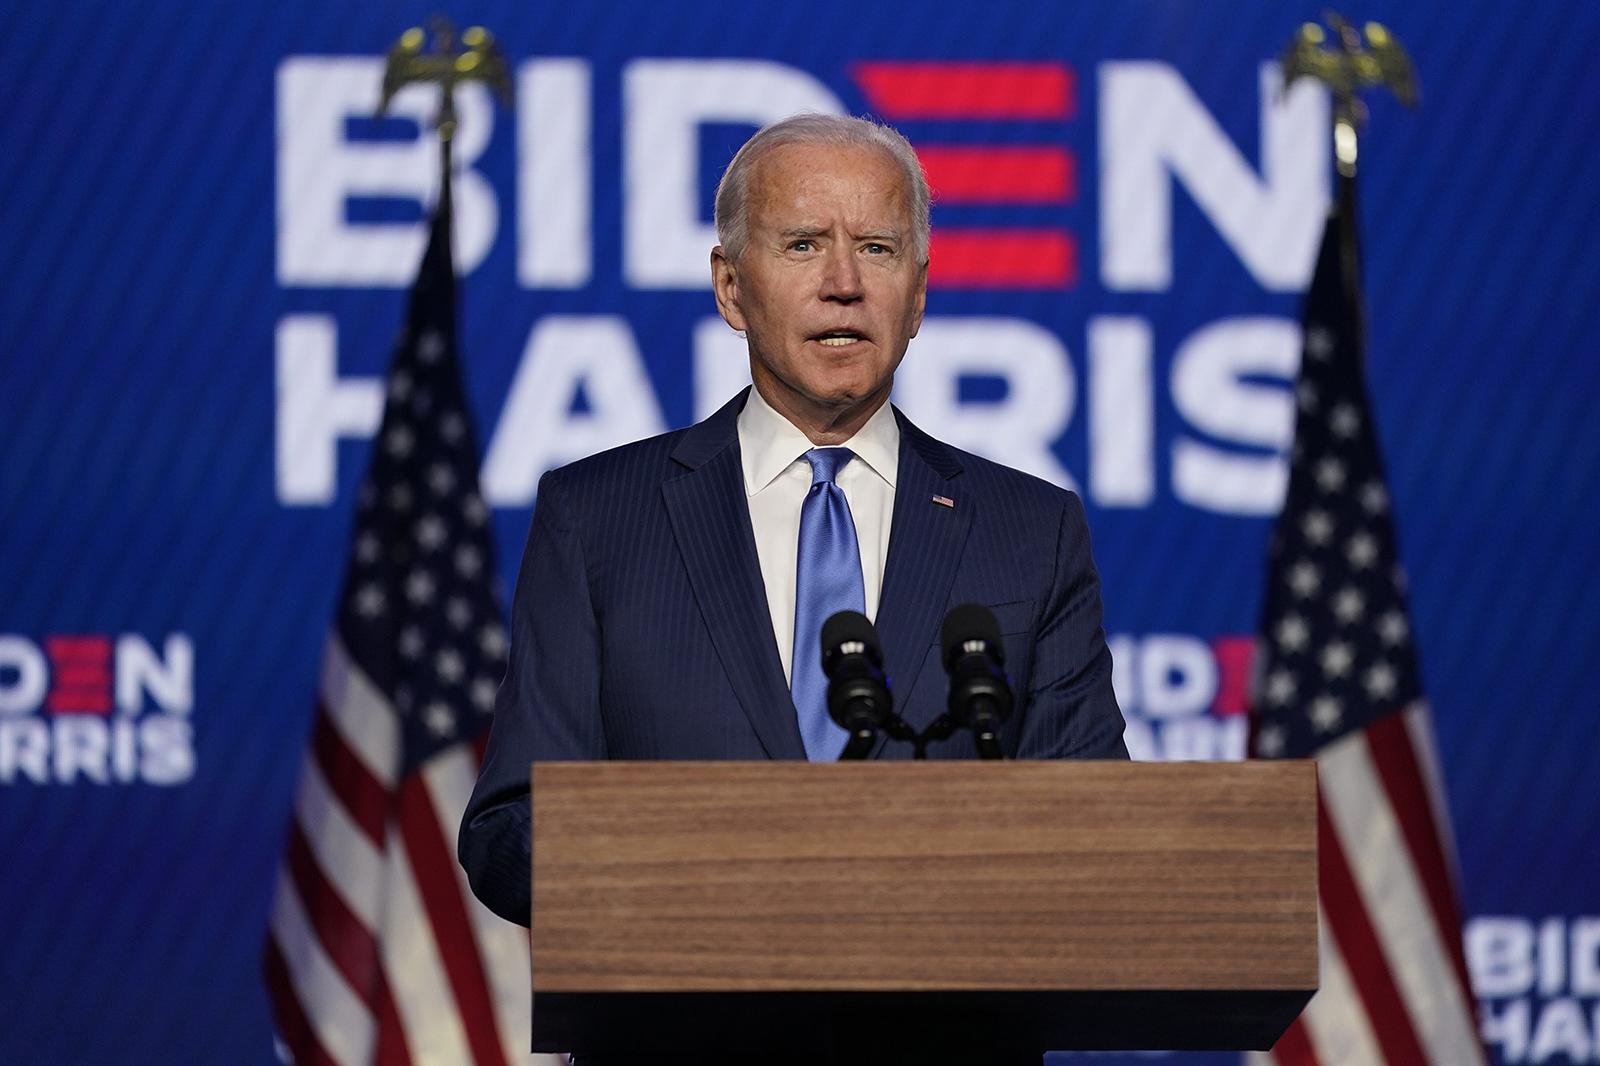 Democratic presidential candidate and former Vice President Joe Biden speaks in Wilmington, Delaware, on November 6.